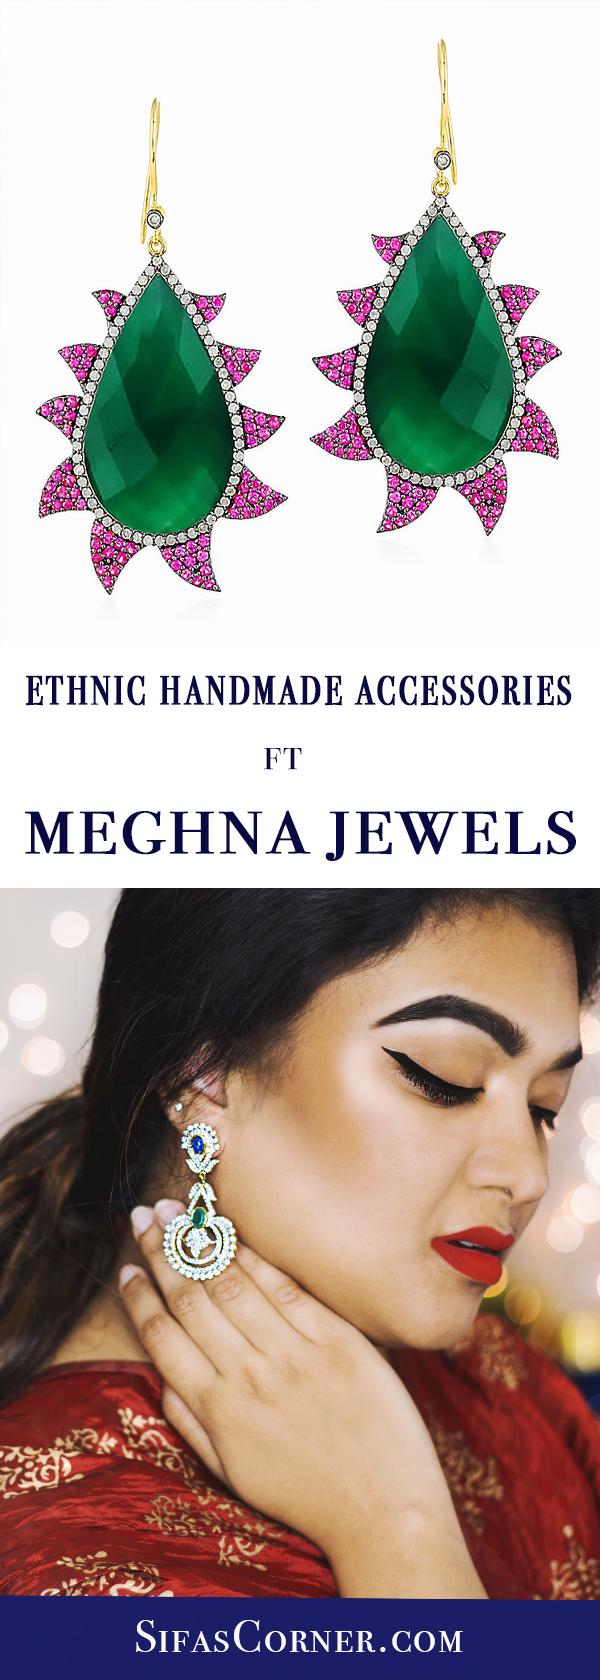 Meghna-Jewels